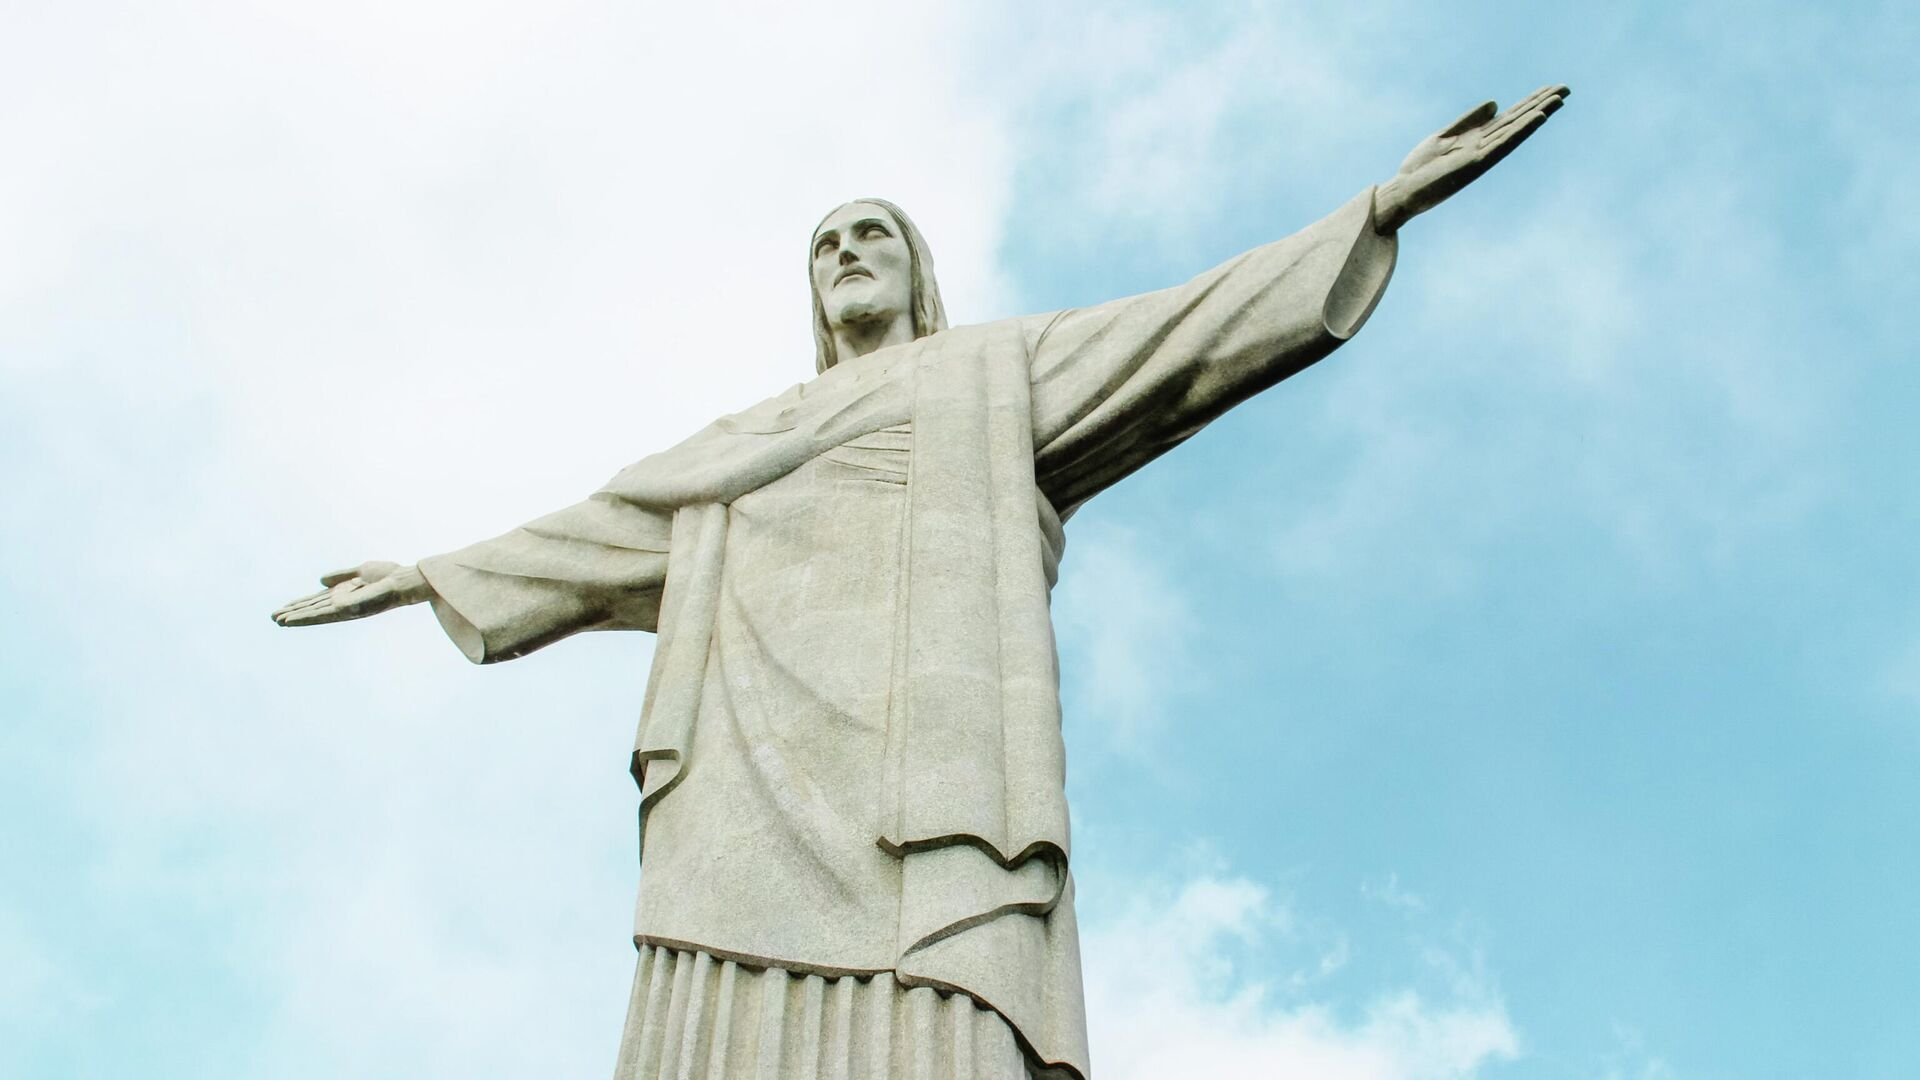 El Cristo Redentor, en Río de Janeiro, Brasil - Sputnik Mundo, 1920, 30.09.2021